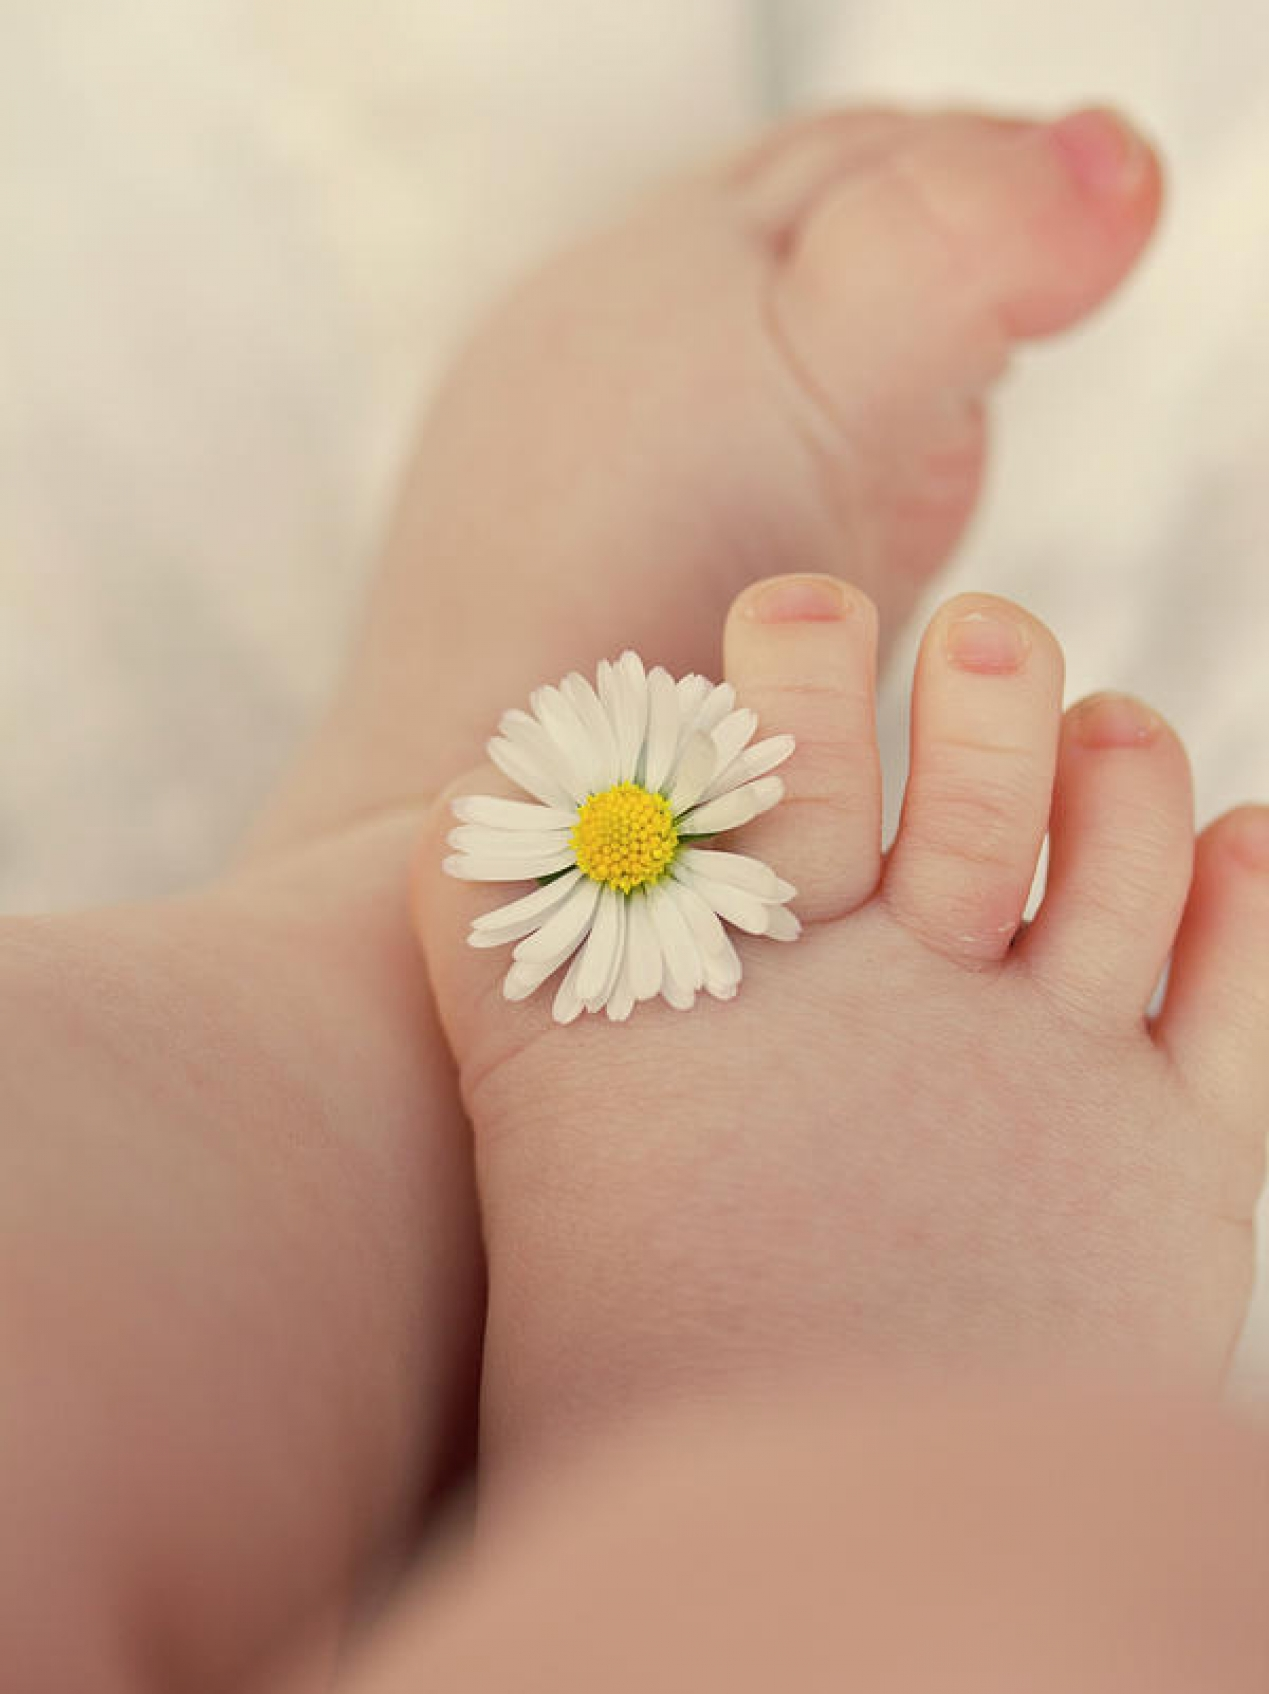 flower-in-baby-toes-augenwerke-fotografie–nadine-grimm